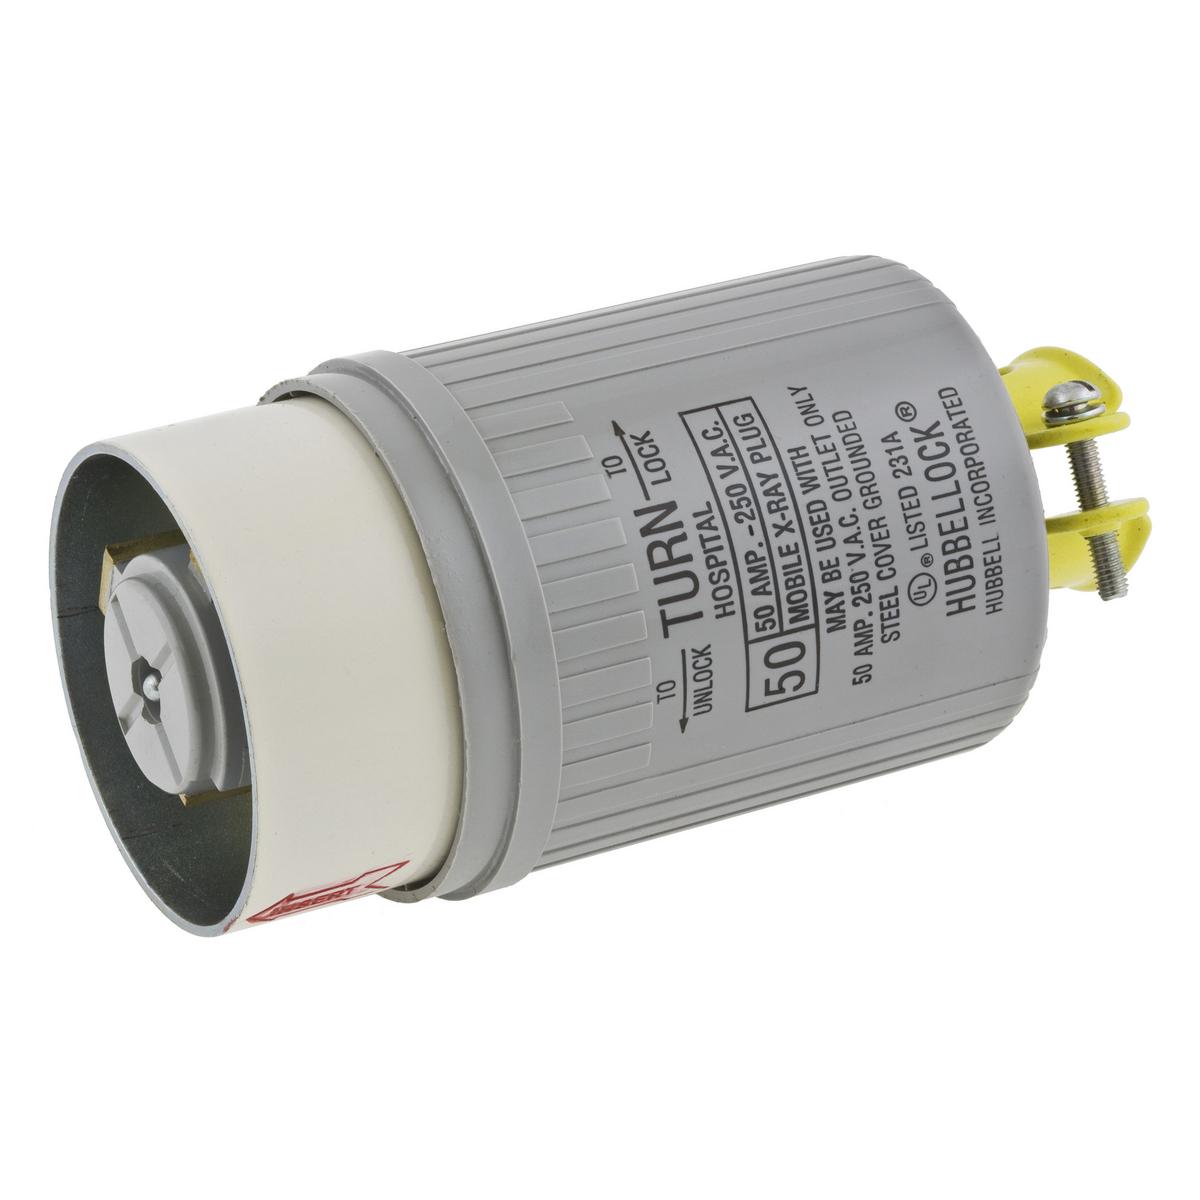 Hbl25525 Hubbellock Devices Hospital Products Wiring 250 Volt 50 Amp Ac Wbp Prodimage Alt